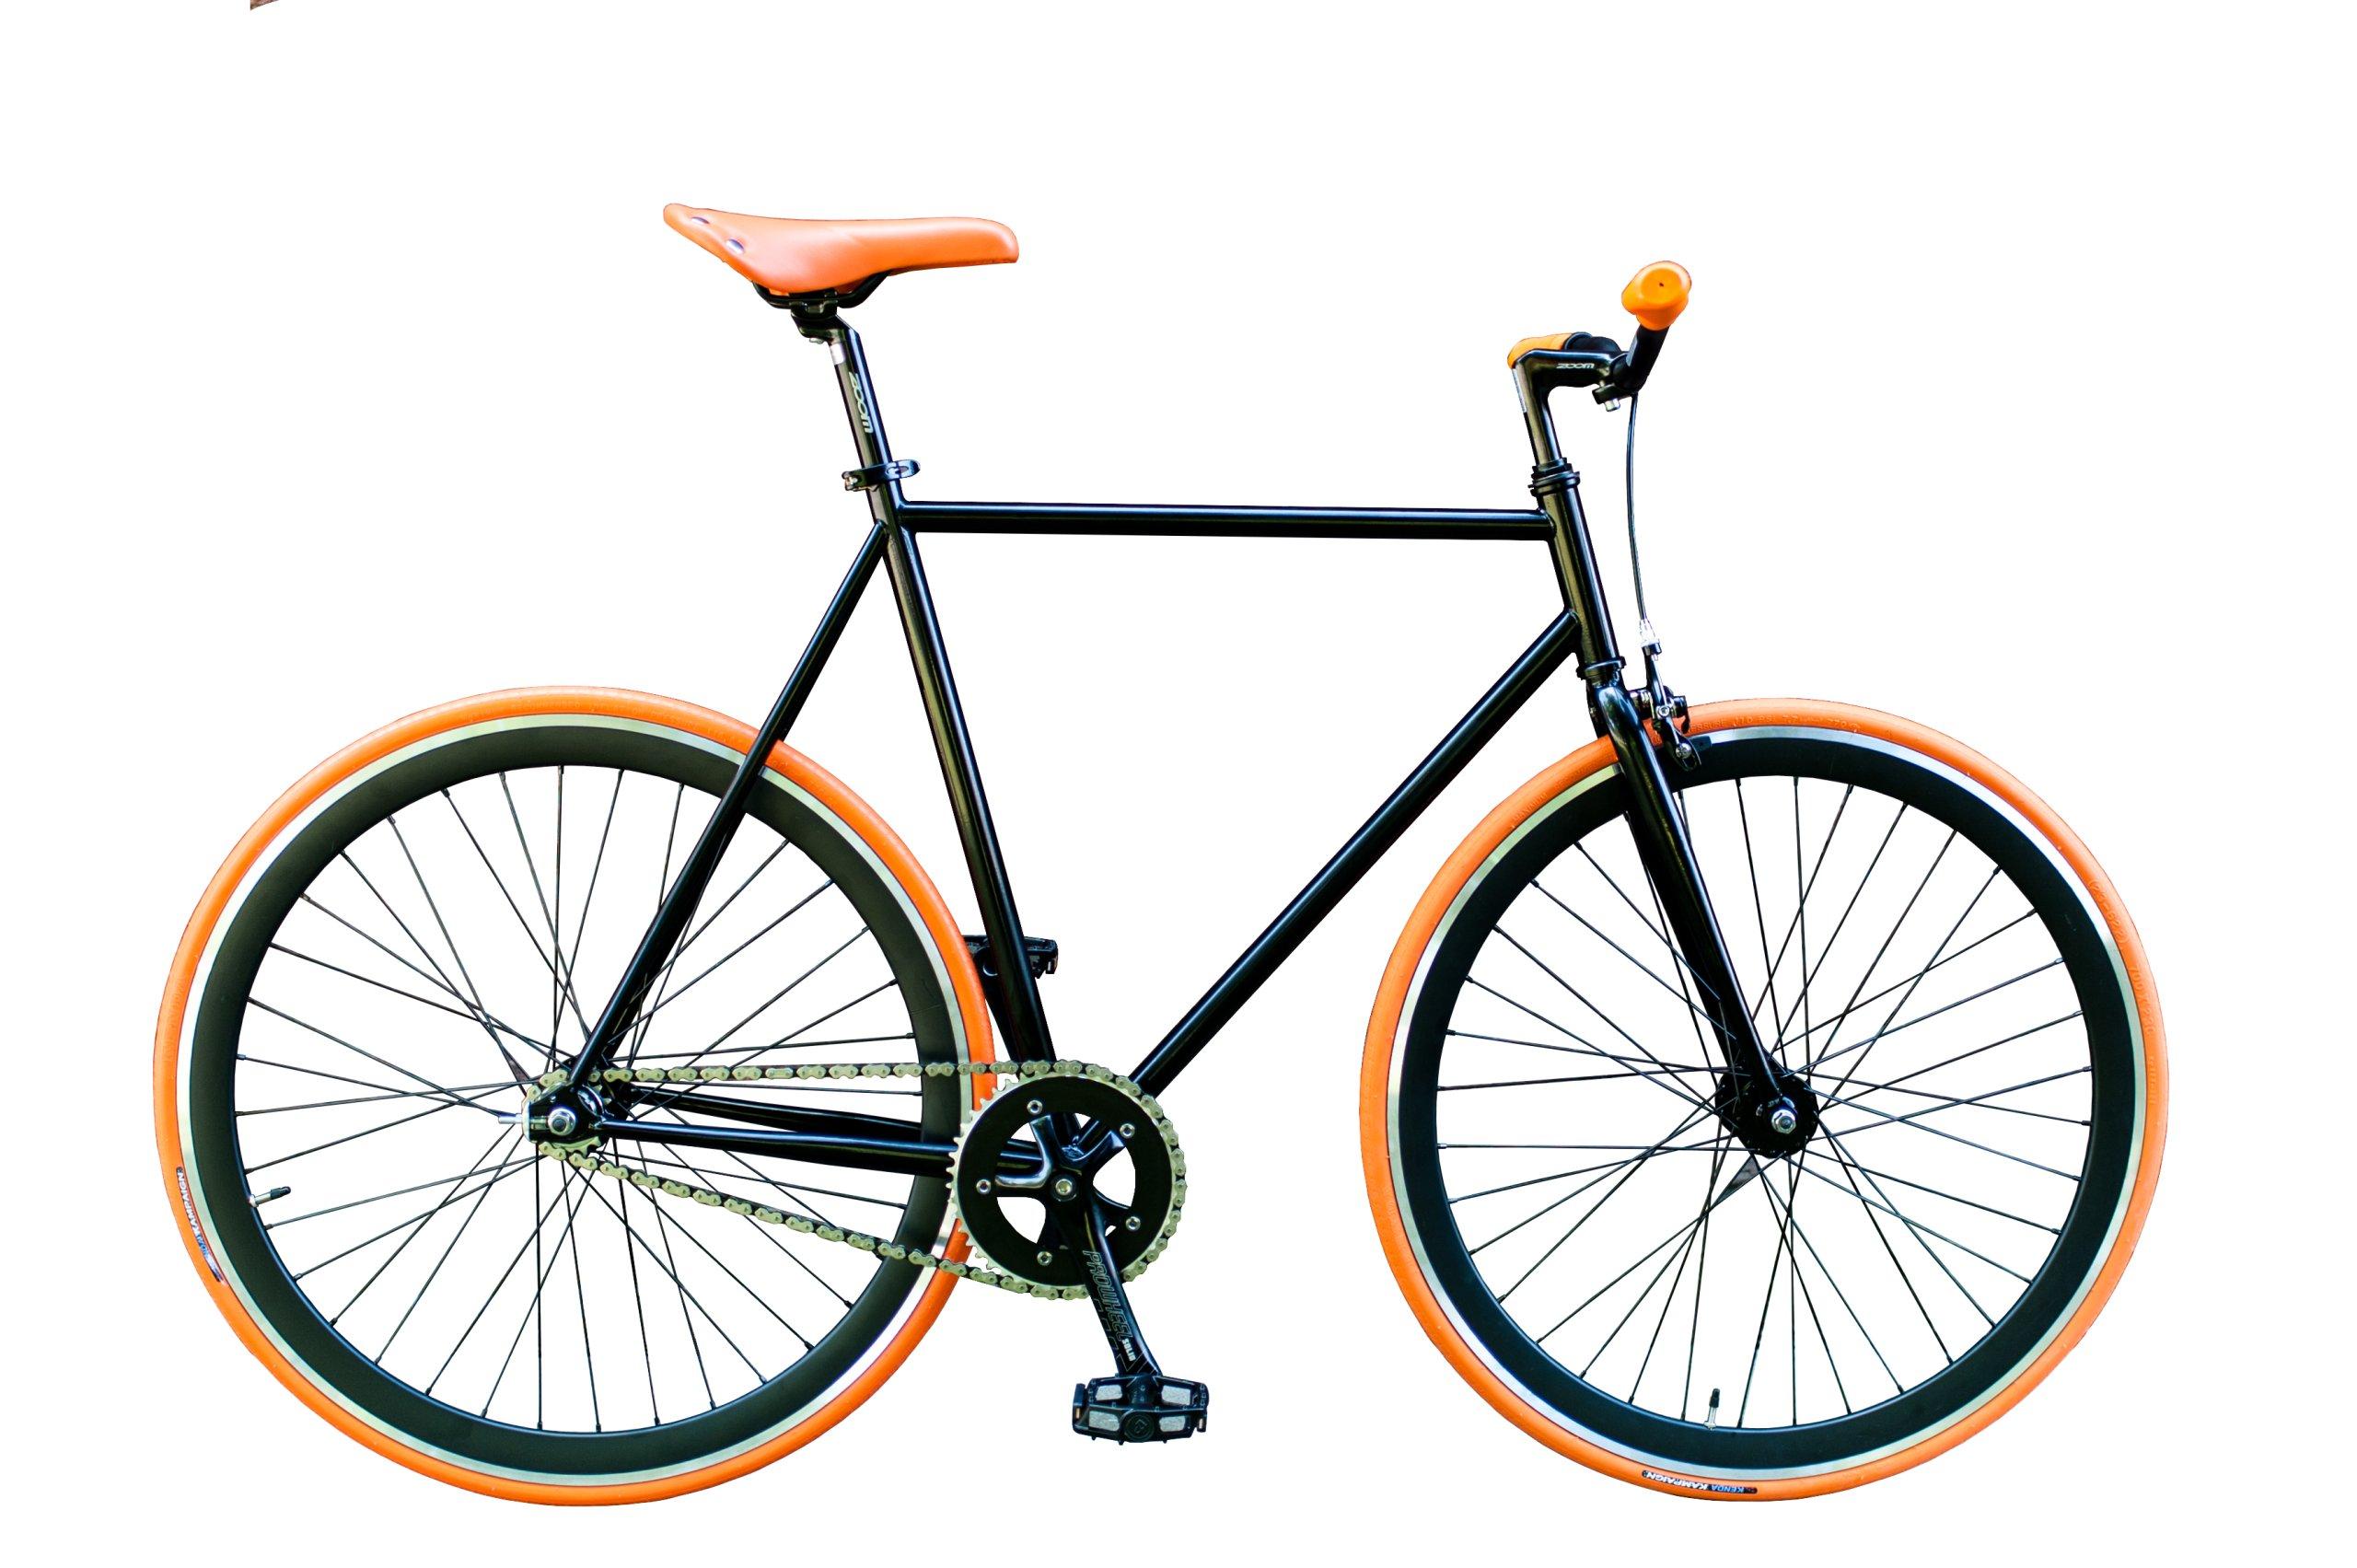 Woo Hoo bicykli Bicykle - ORANŽOVÁ, hot Kolesá 19